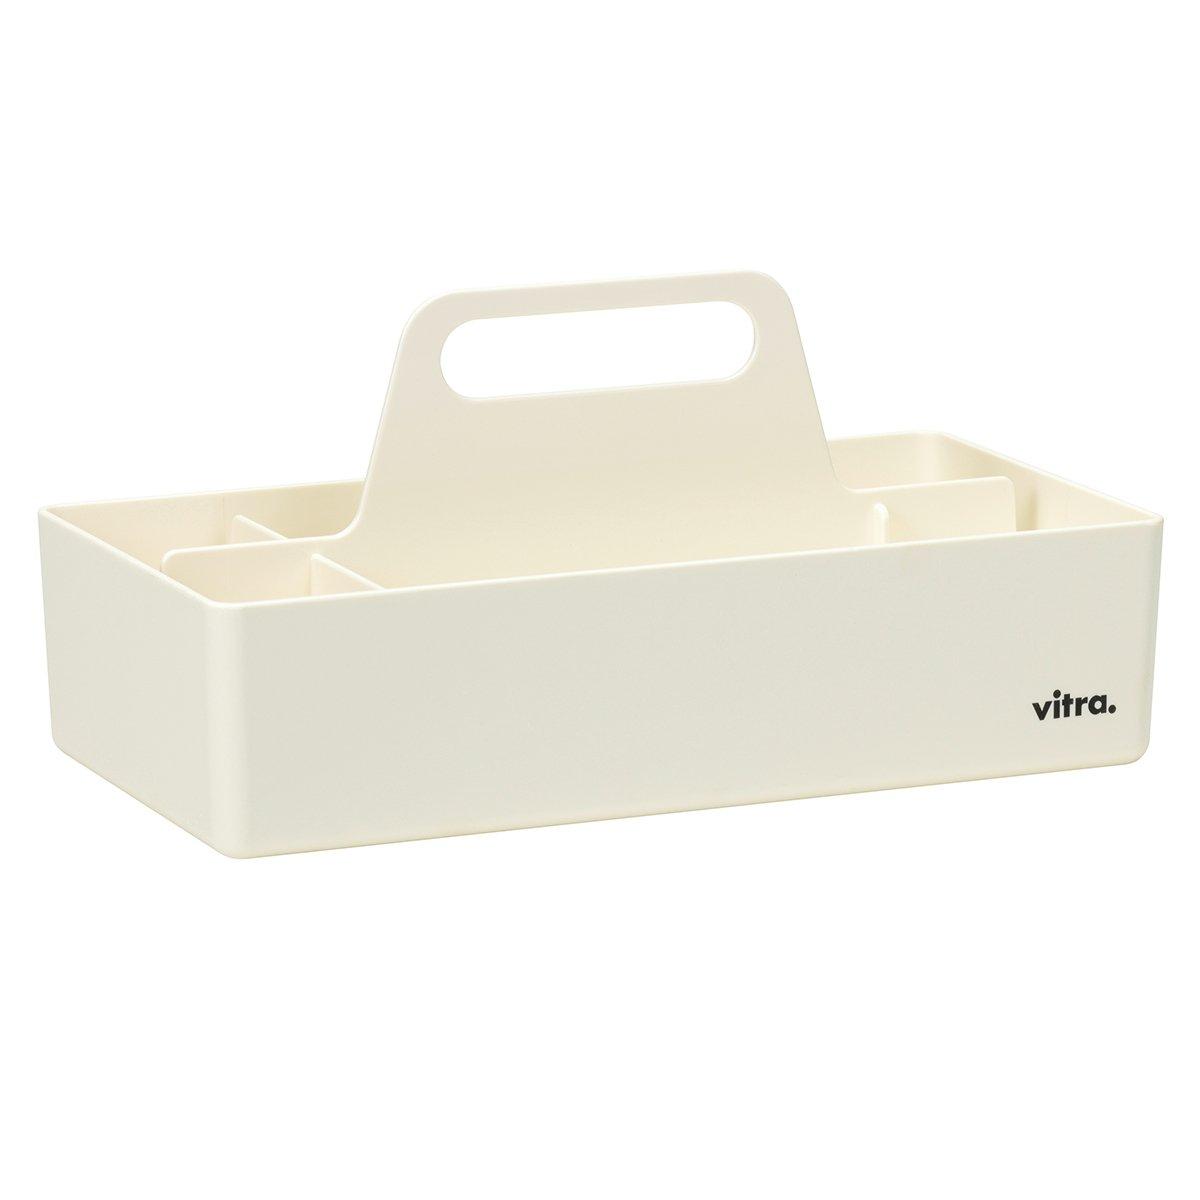 Vitra Storage Toolbox Opbergbak - Wit